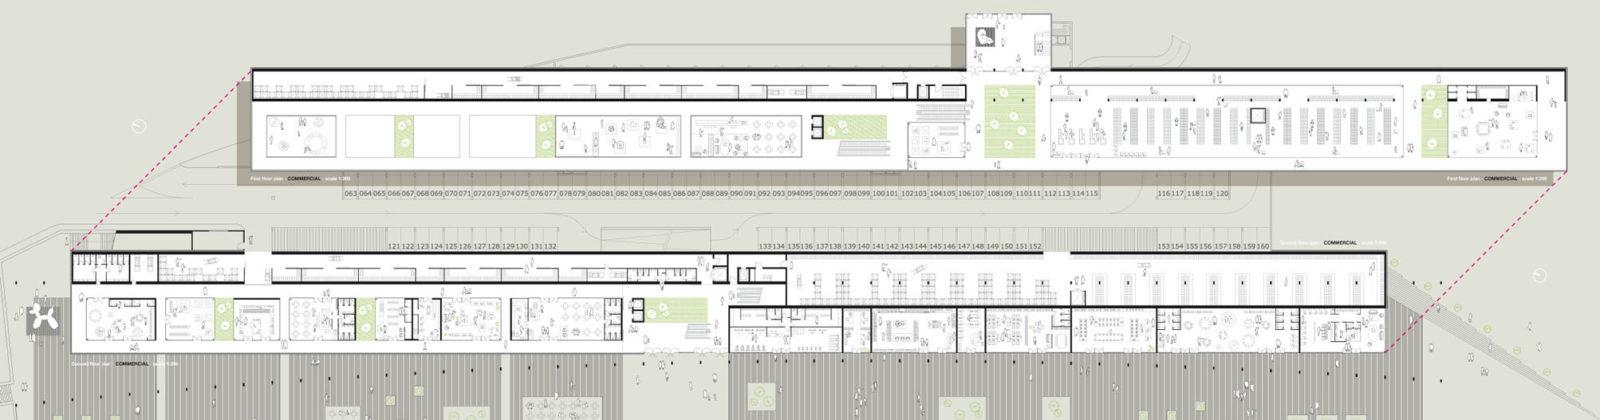 mall plans